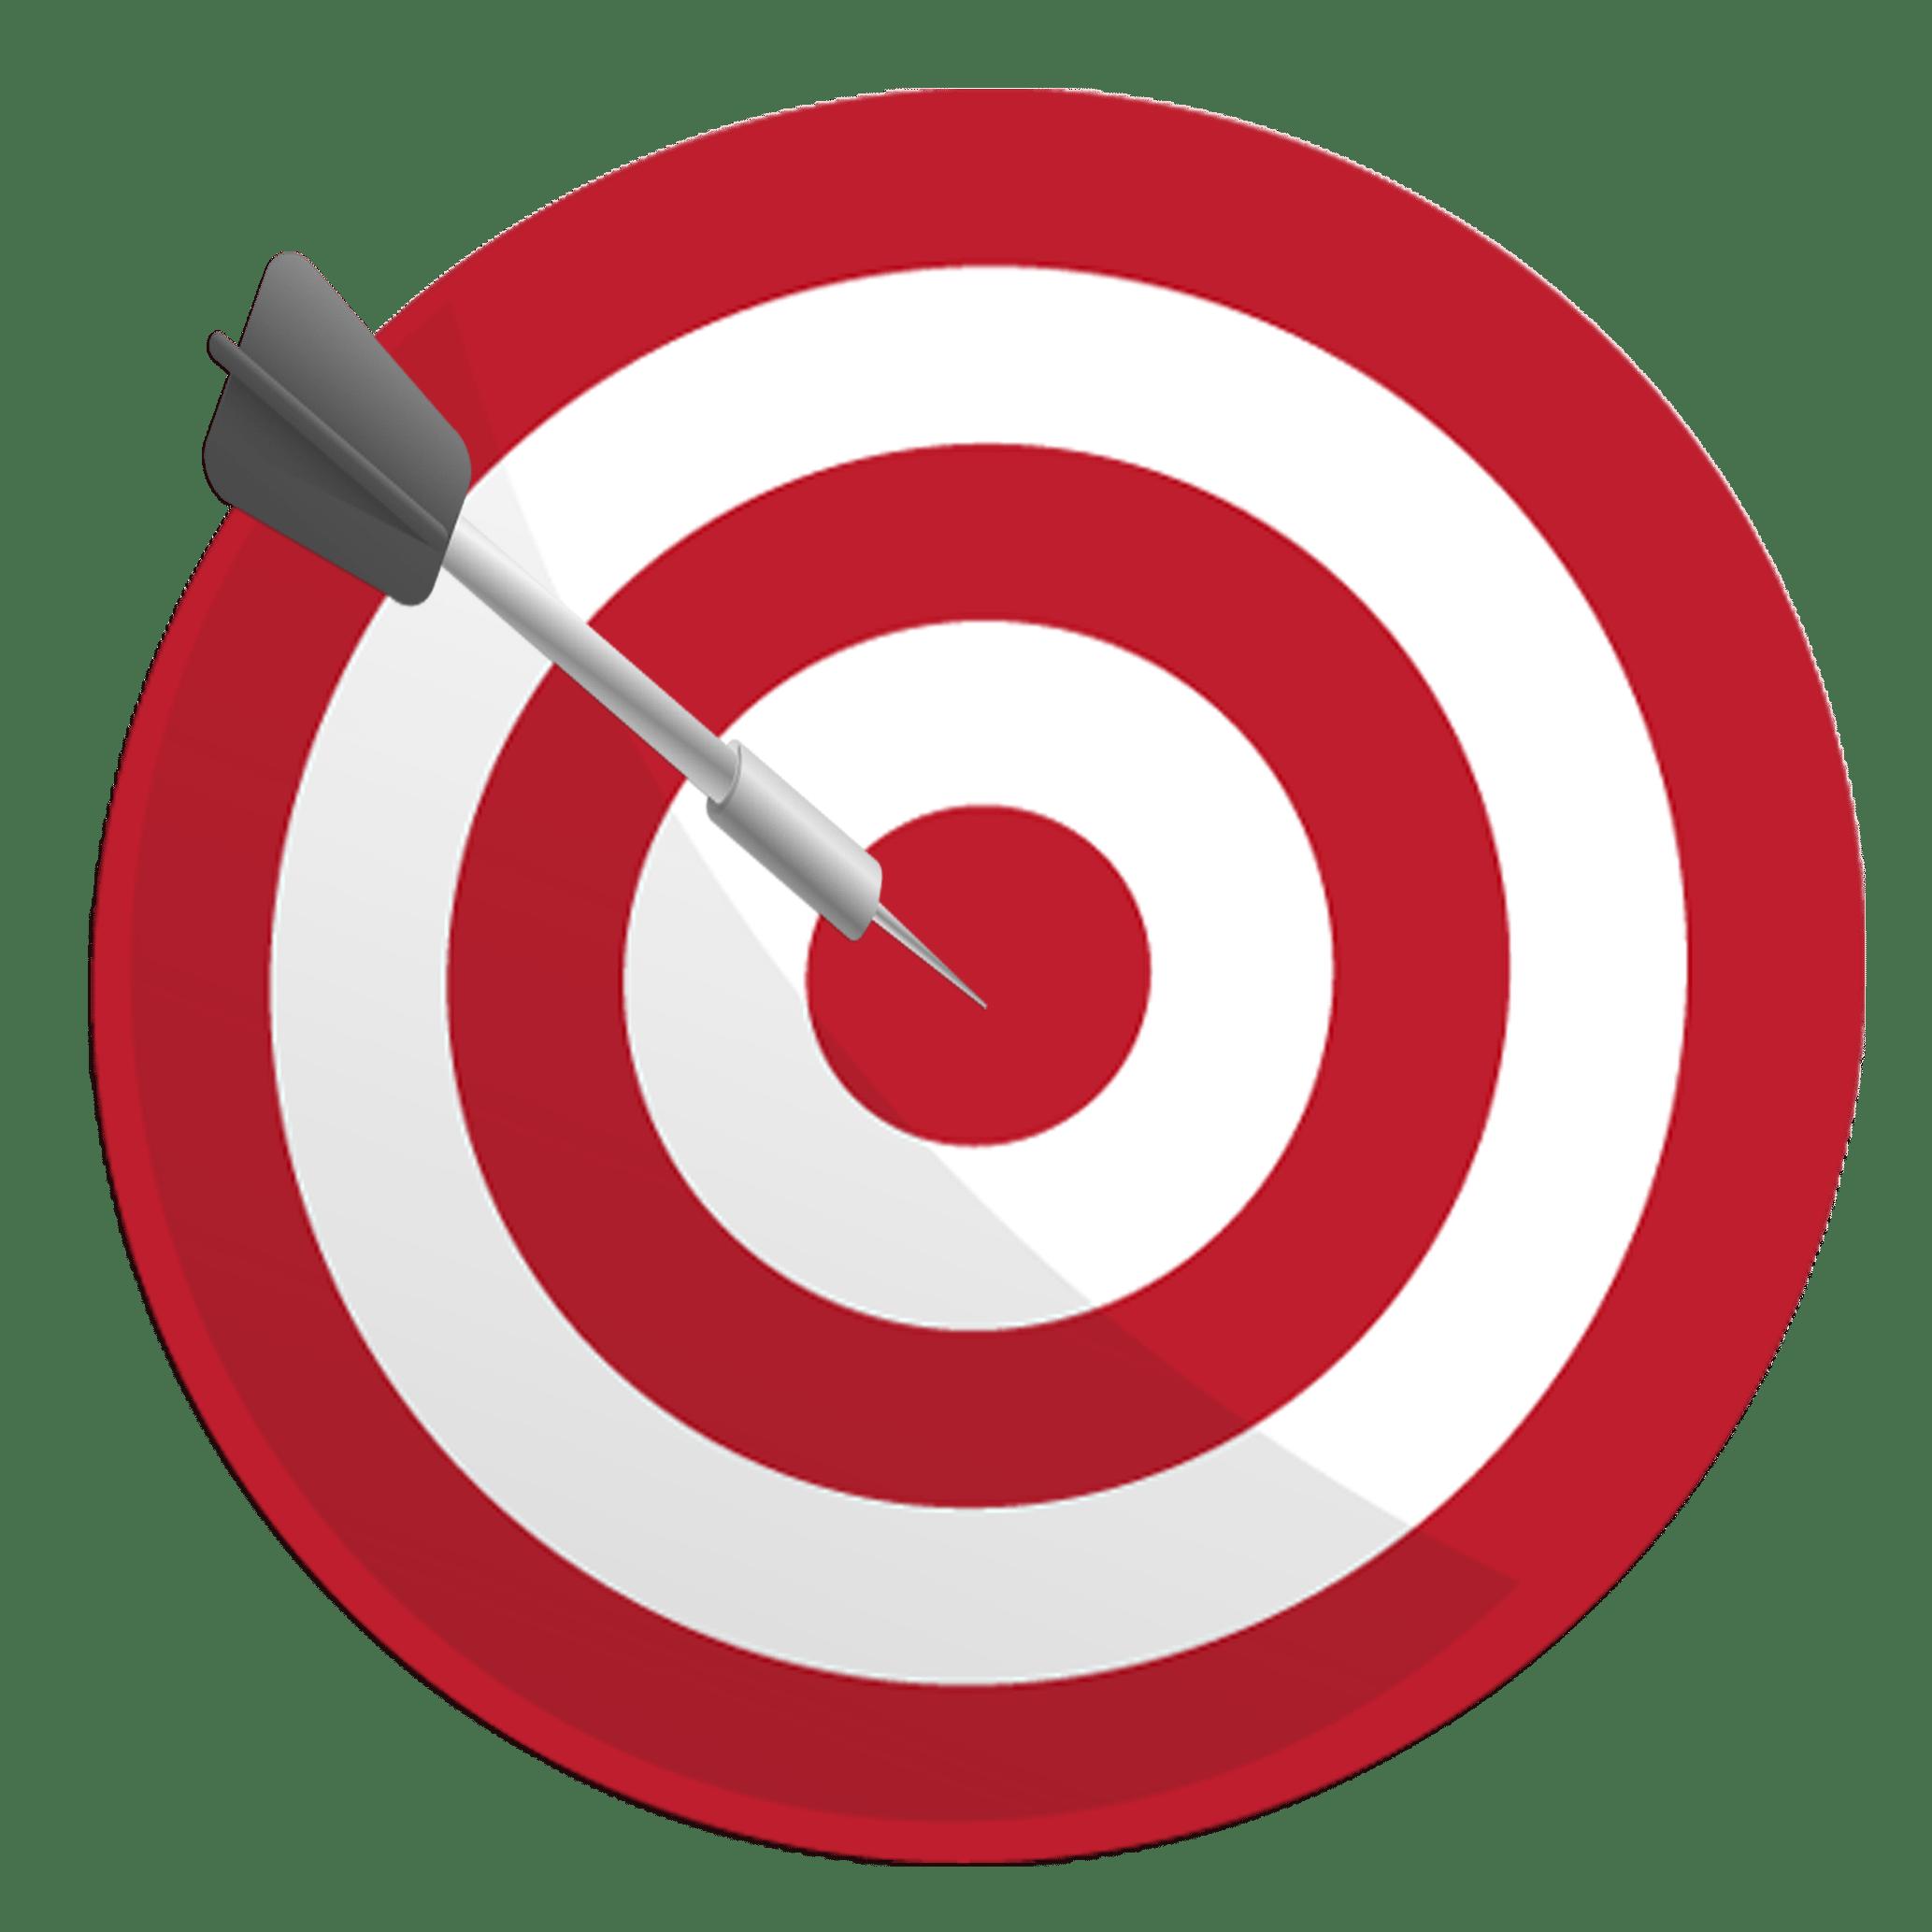 dart accent reduction